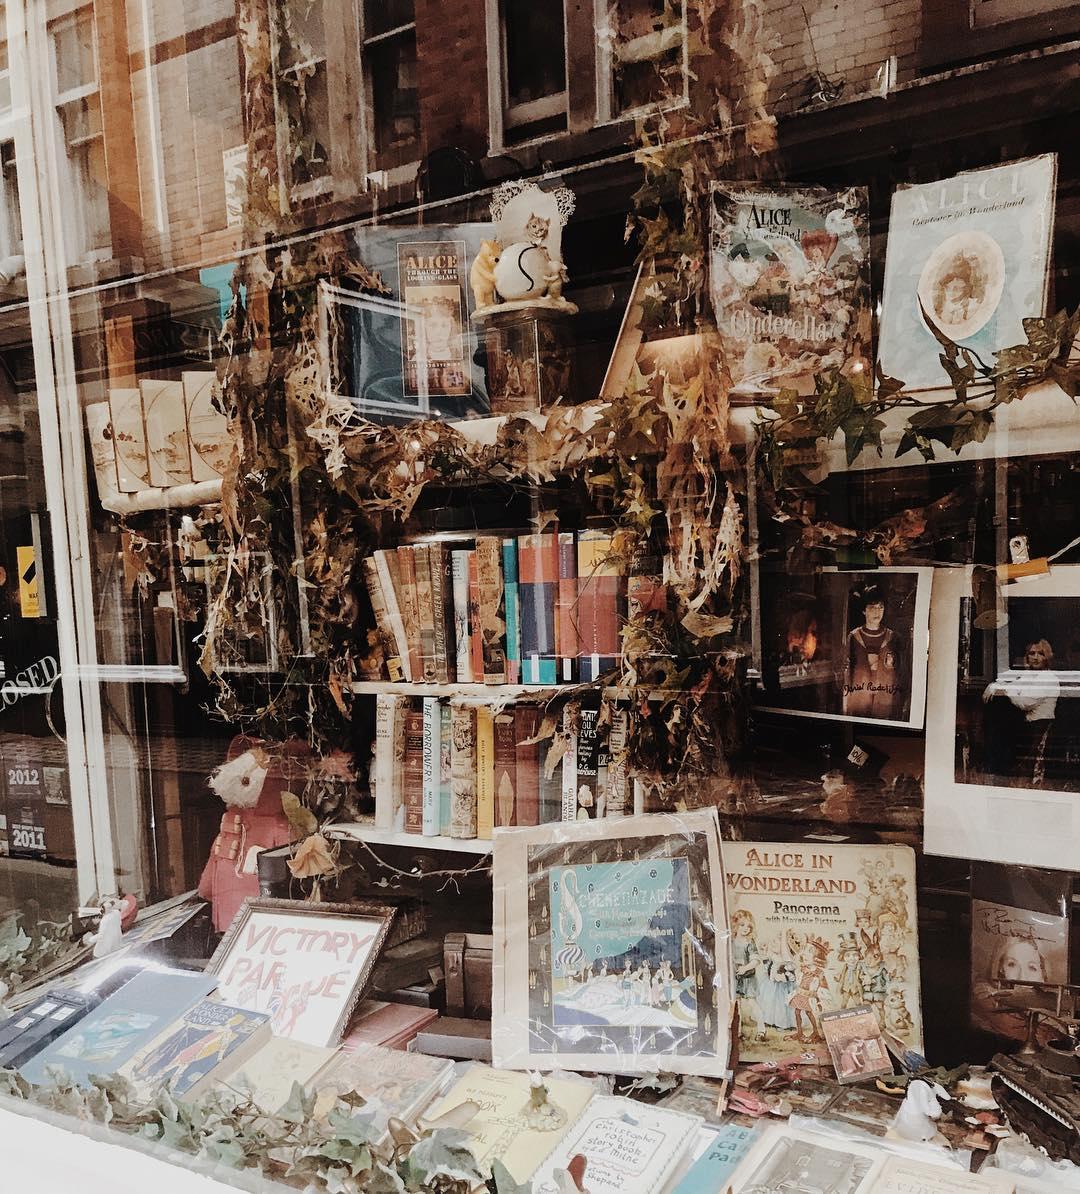 Cecil Court Bookshop Window